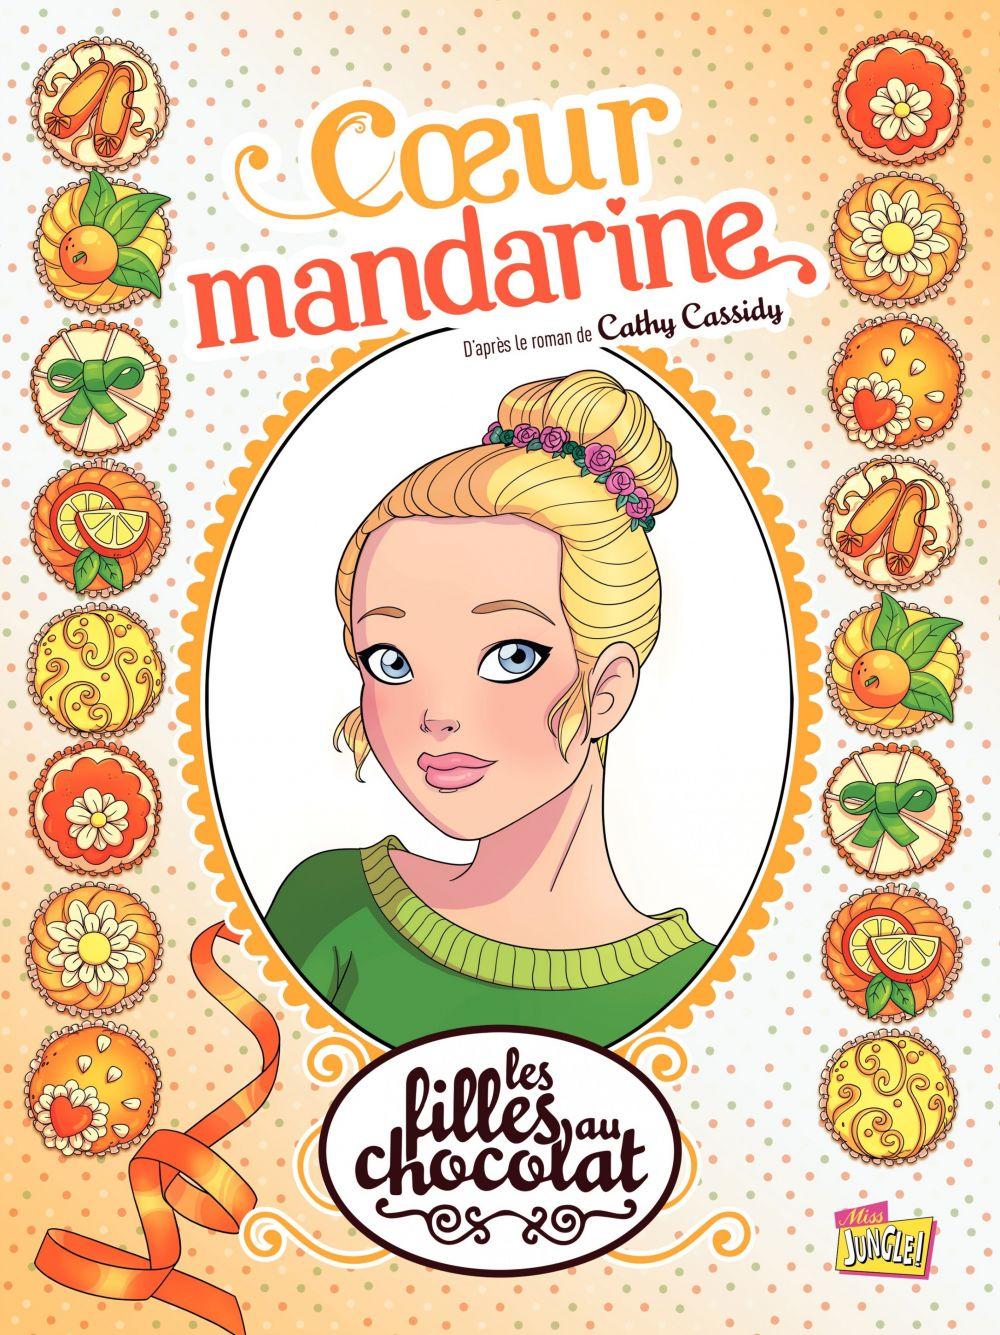 Les filles au chocolat - Tome 3 - Cœur Mandarine | Raymond Sébastien, . Illustrateur